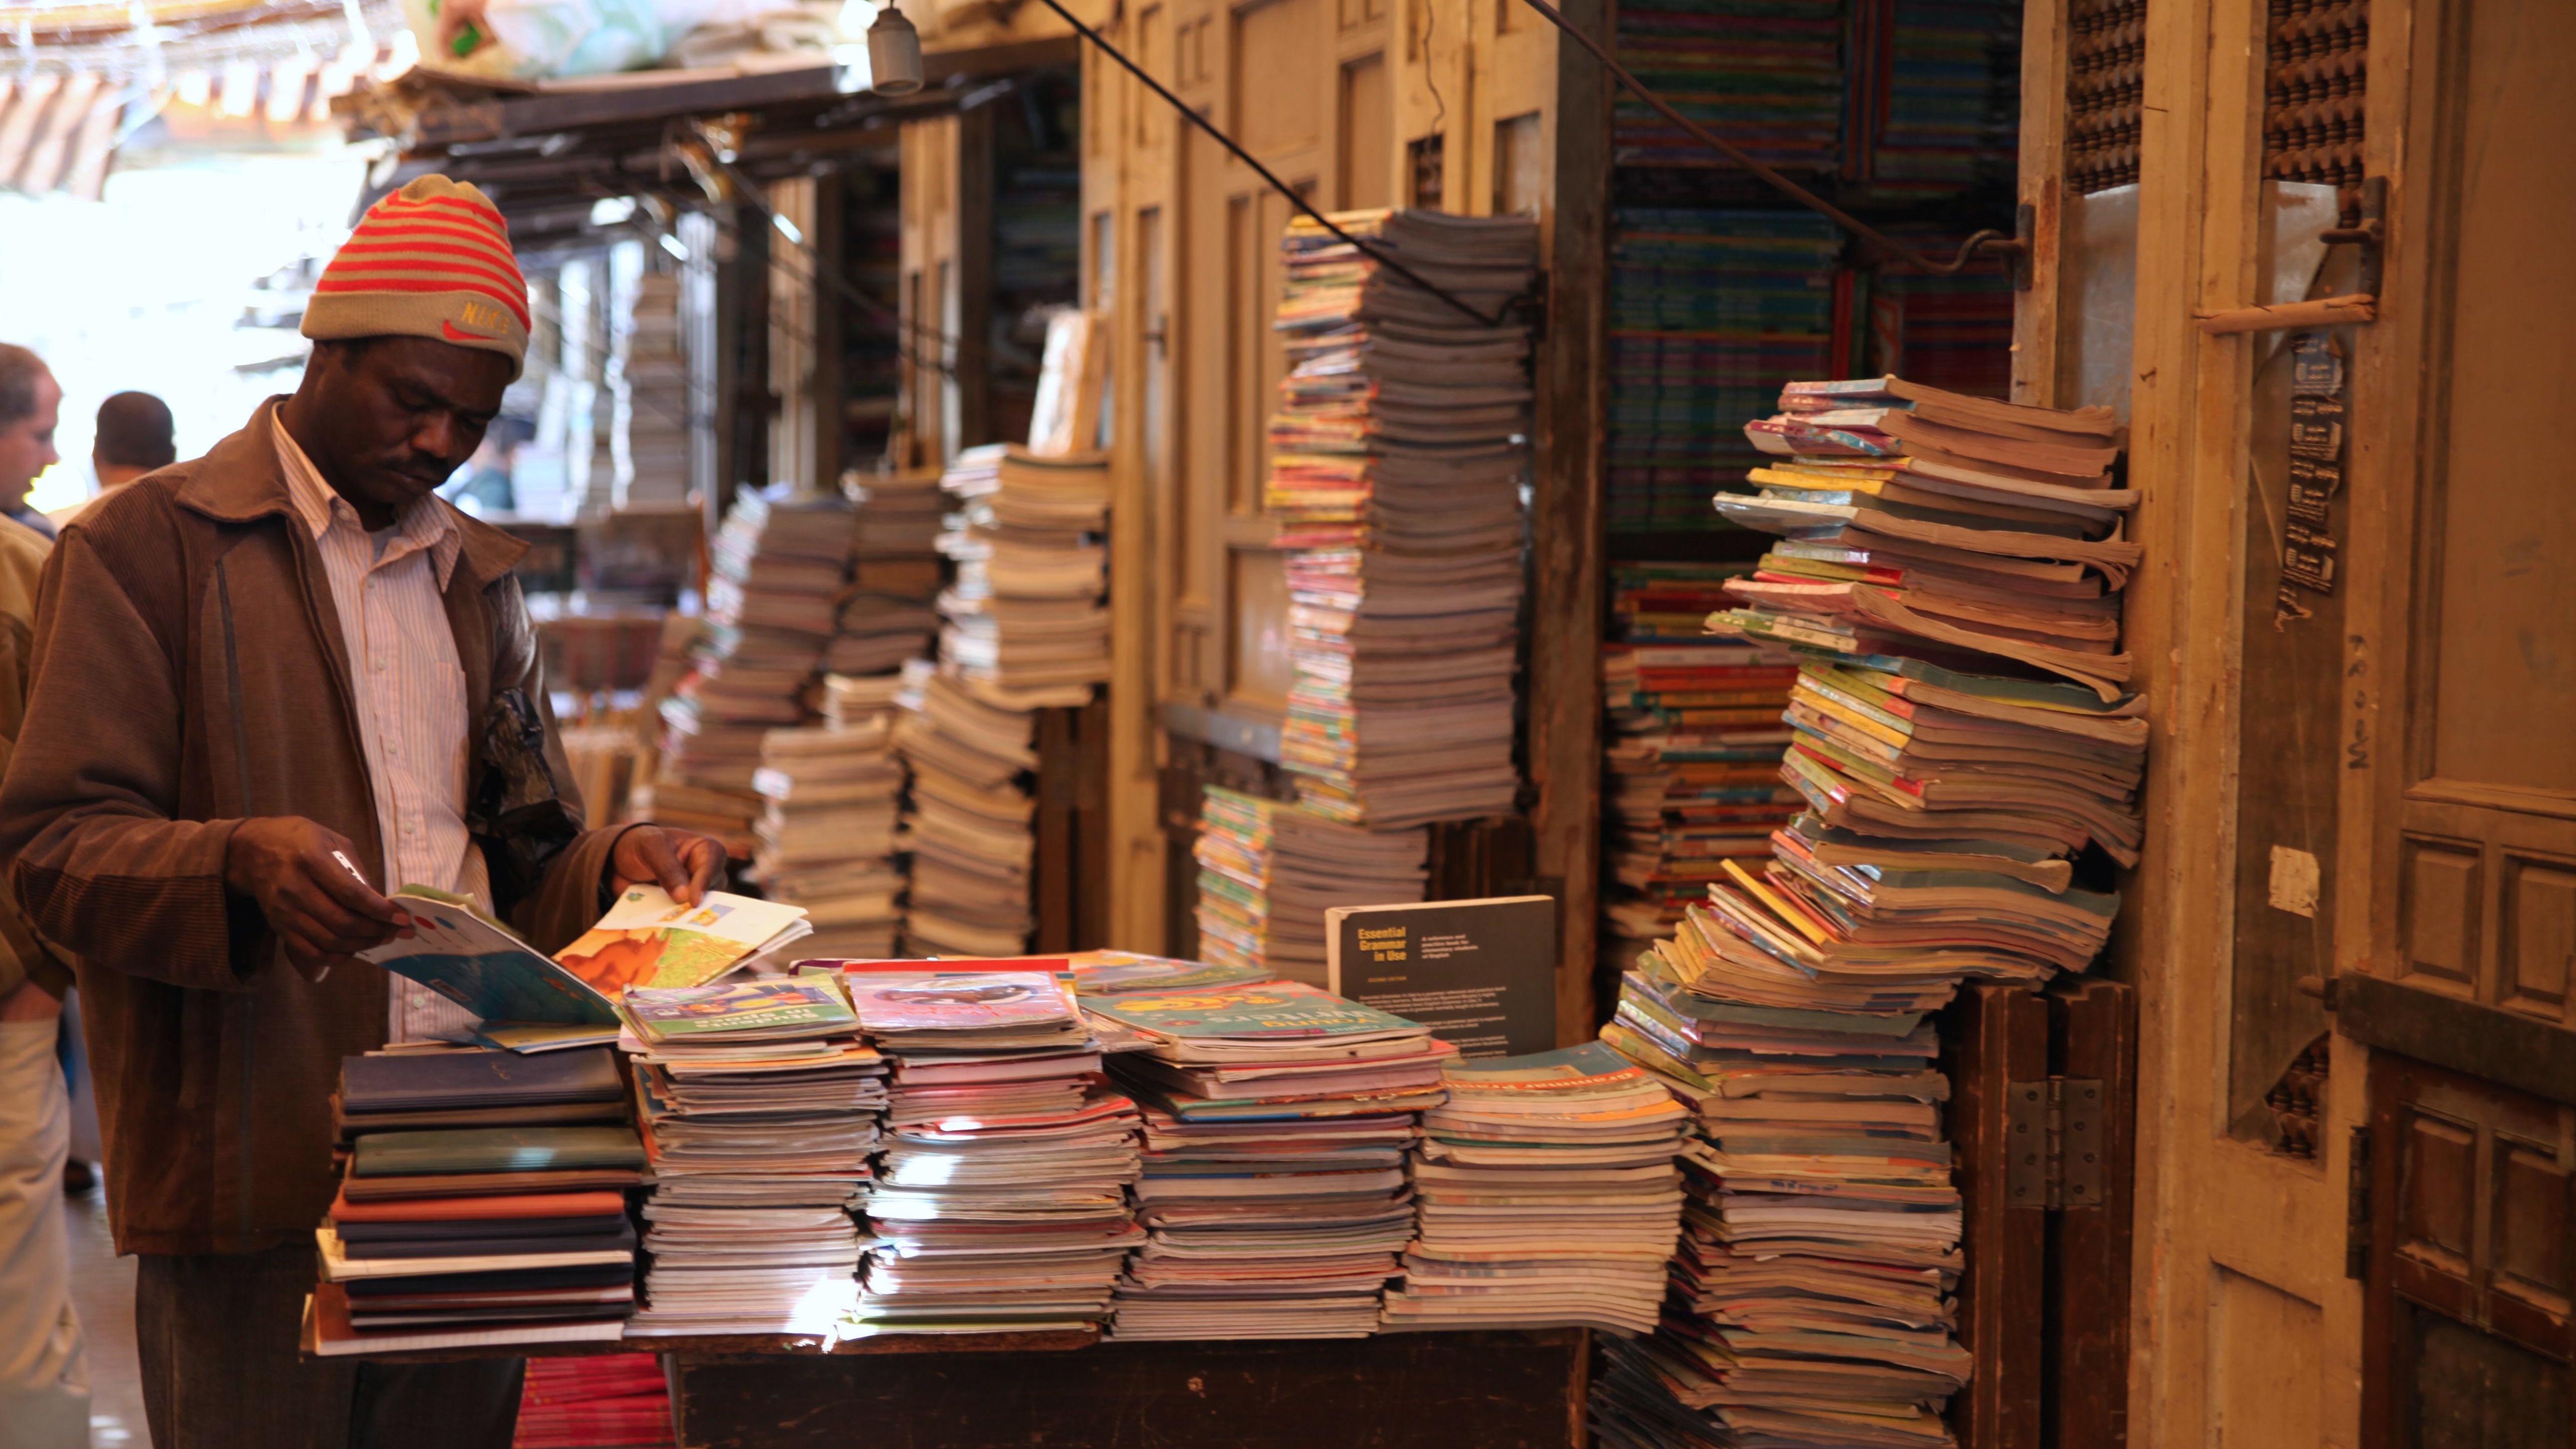 A man browses a stall at Cairo's Ezbekiya book market